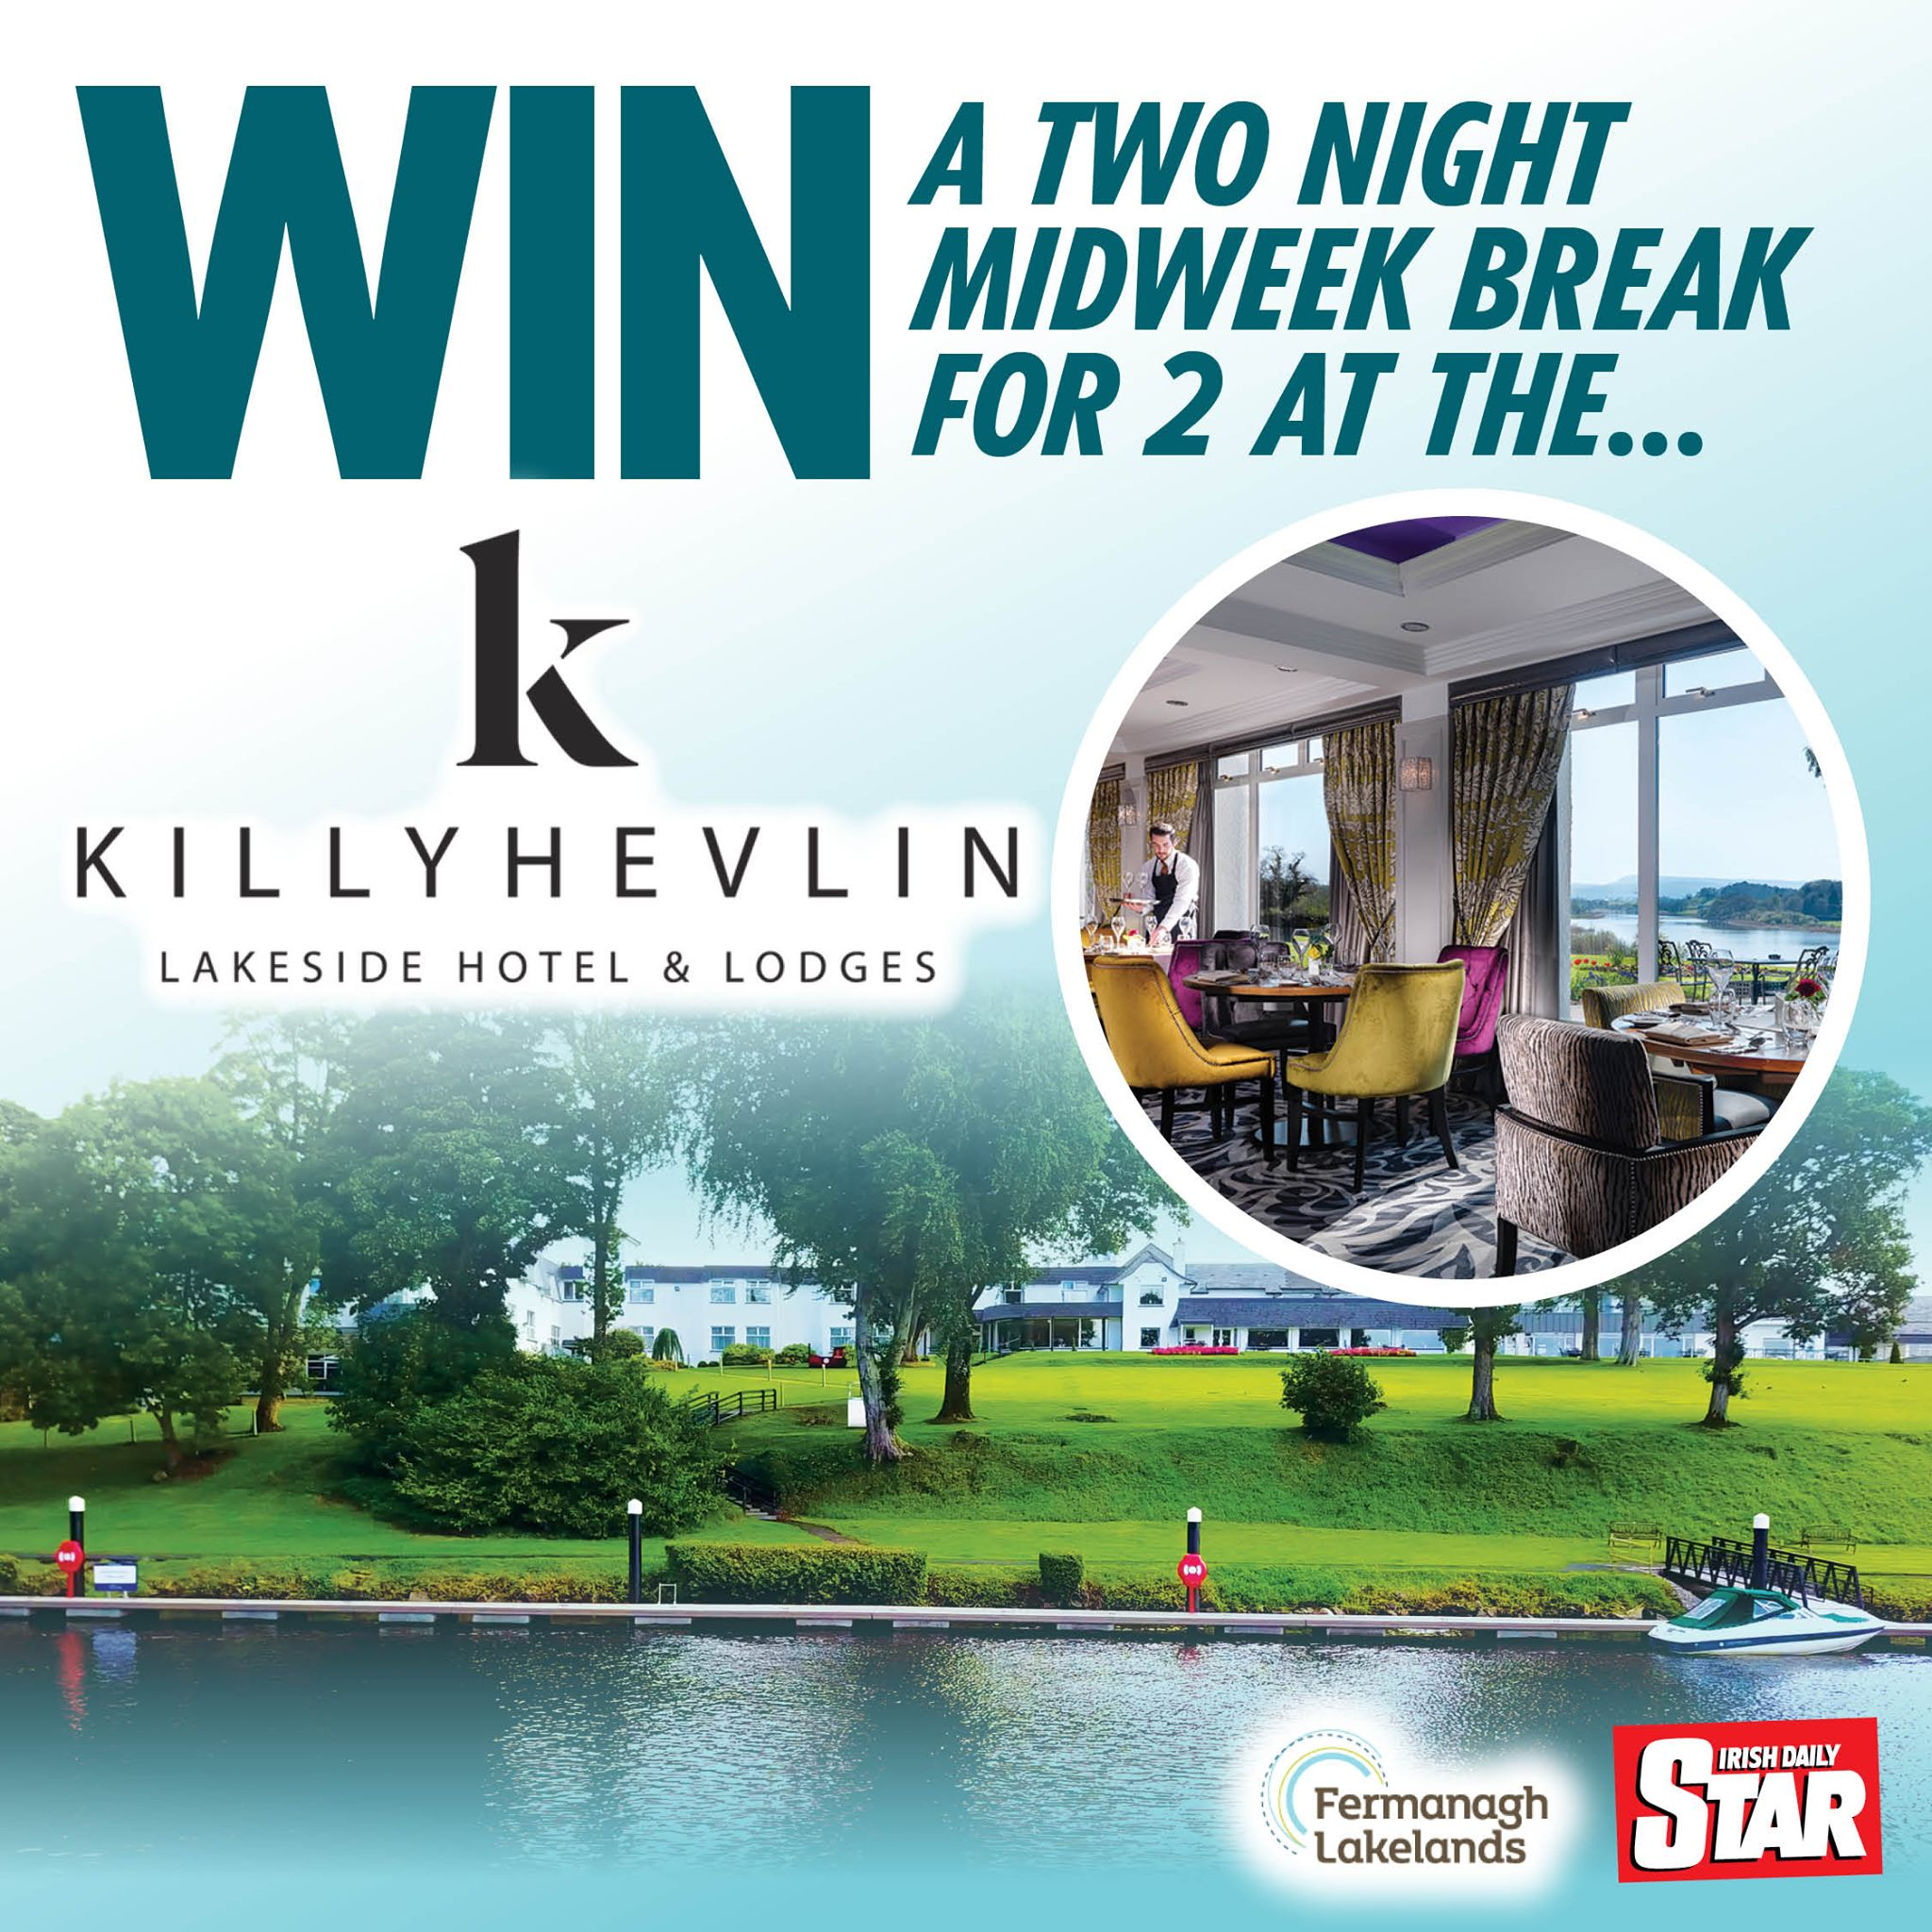 Win a wonderful break to Killyhevlin Lakeside Hotel and Lodges